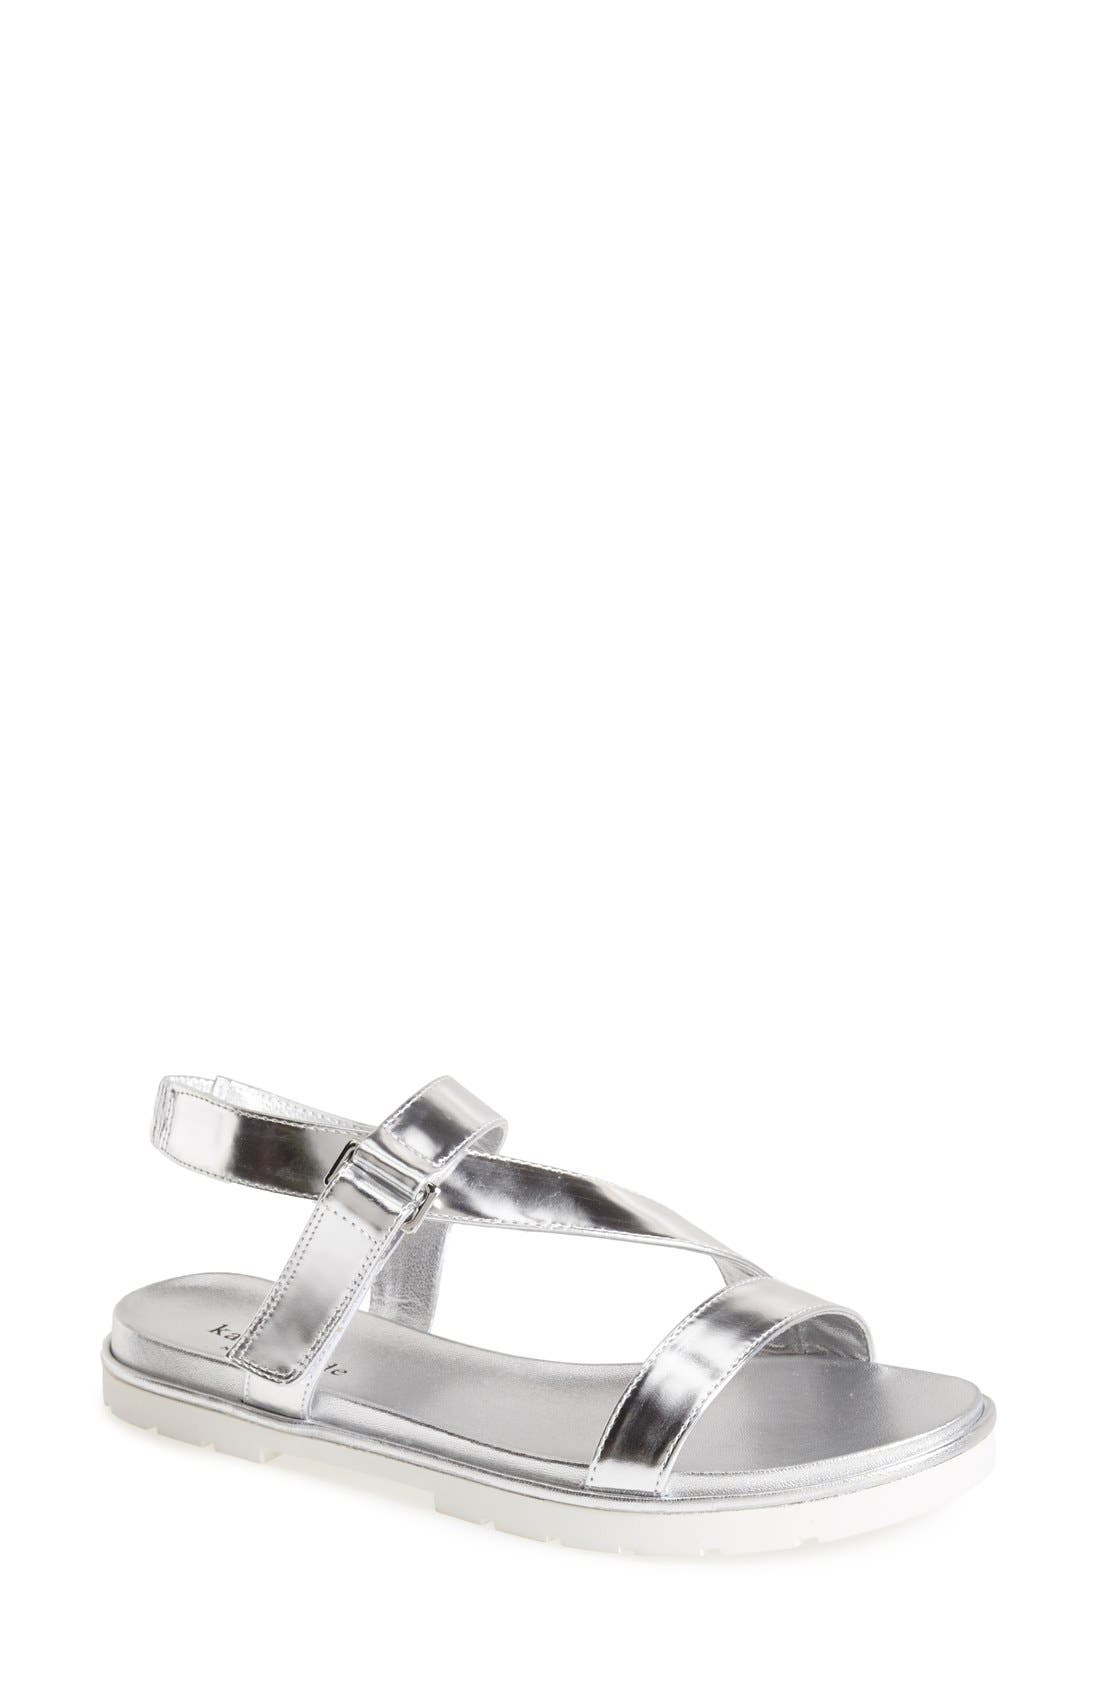 Main Image - kate spade new york 'mckee' leather sandal (Women)